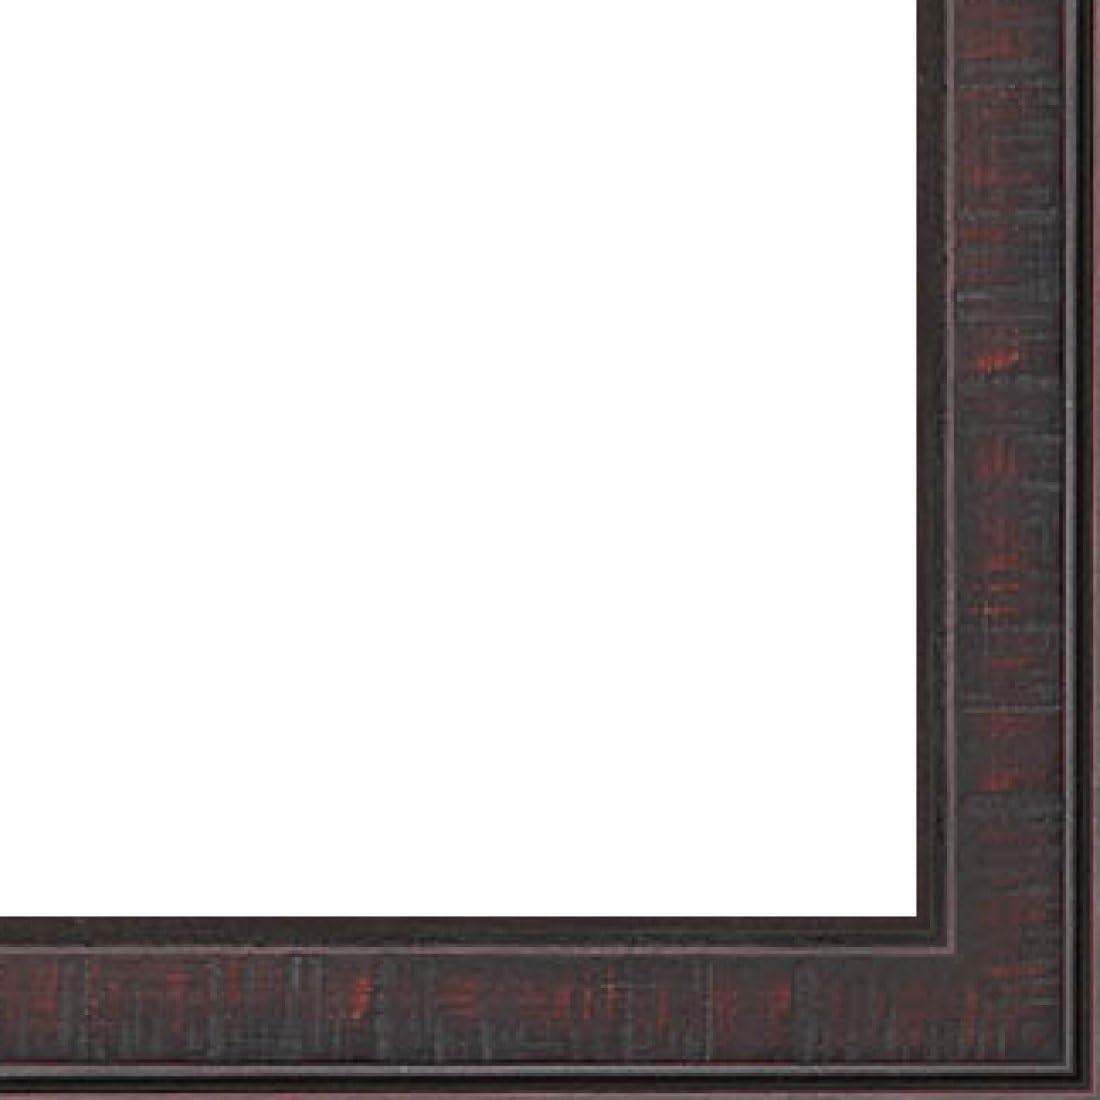 7//16 Rabbet Depth Distressed//Aged Mahogany Finish 0.75 Width Wood Picture Frame Moulding 18ft Bundle